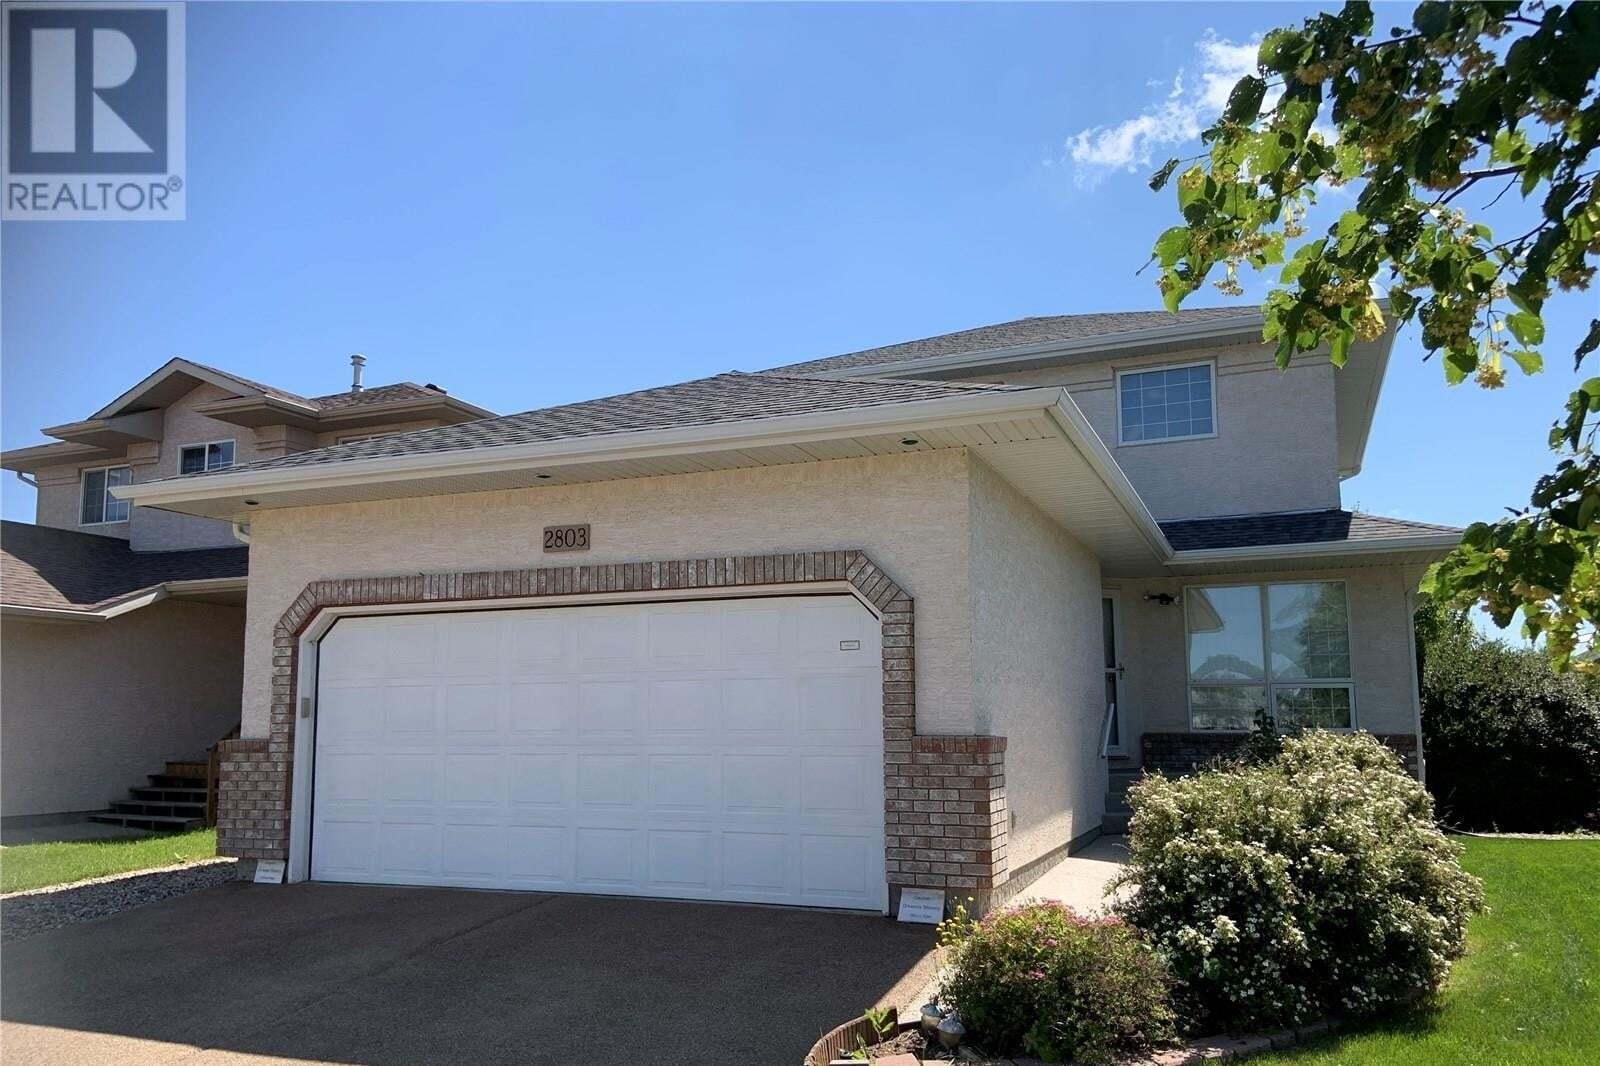 House for sale at 2803 Hayden Park Rd Regina Saskatchewan - MLS: SK816947